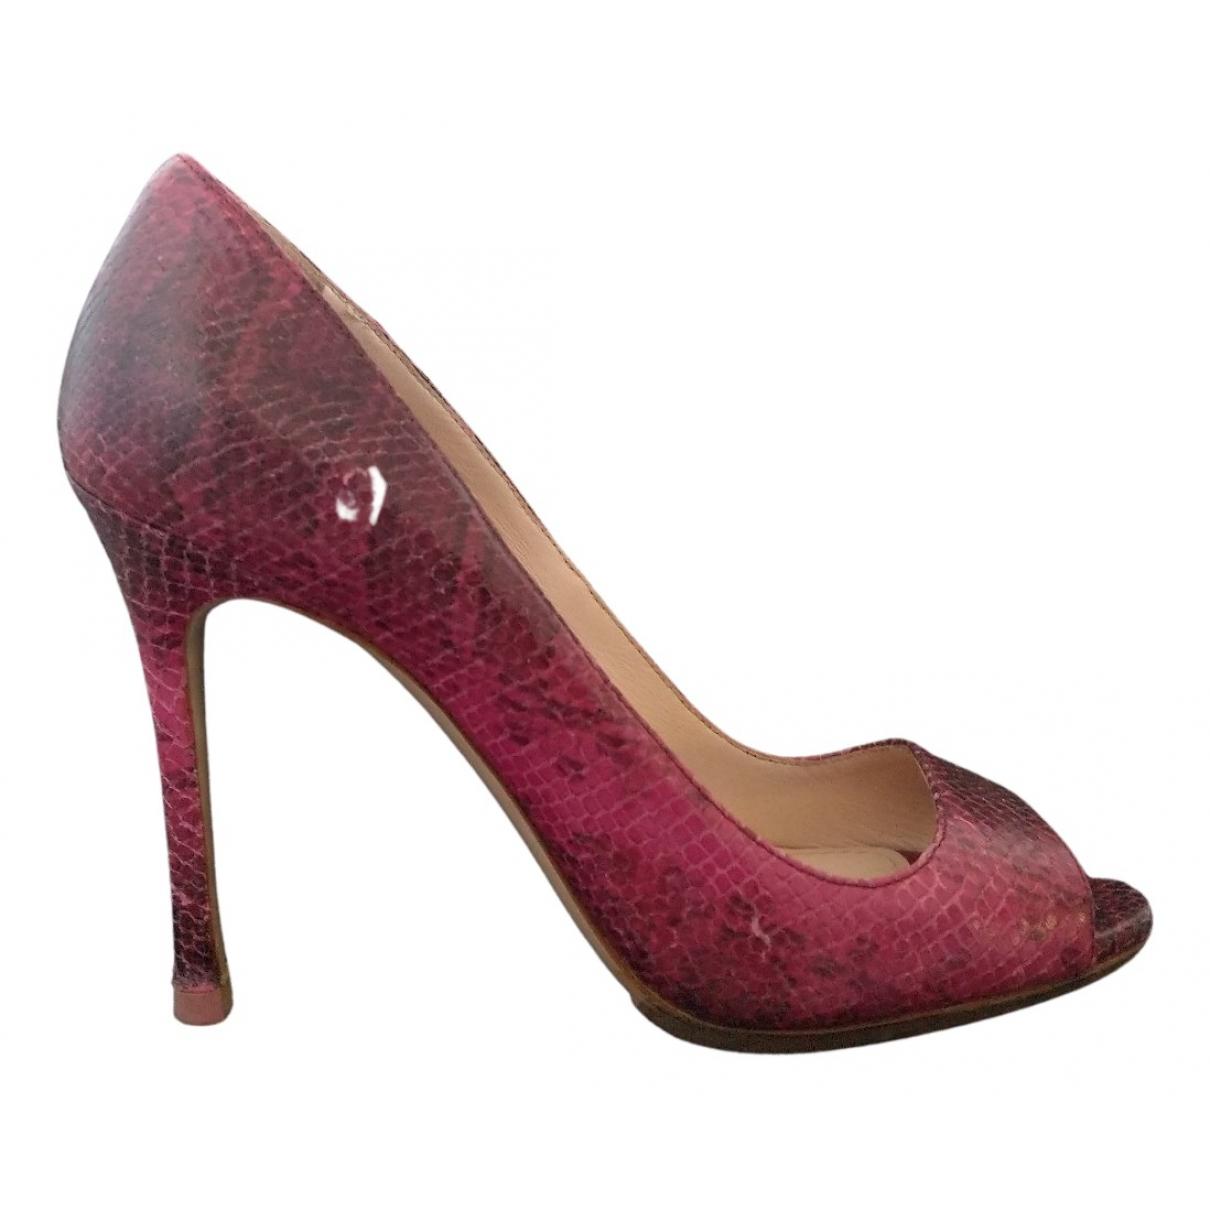 Miu Miu N Multicolour Leather Heels for Women 36.5 EU